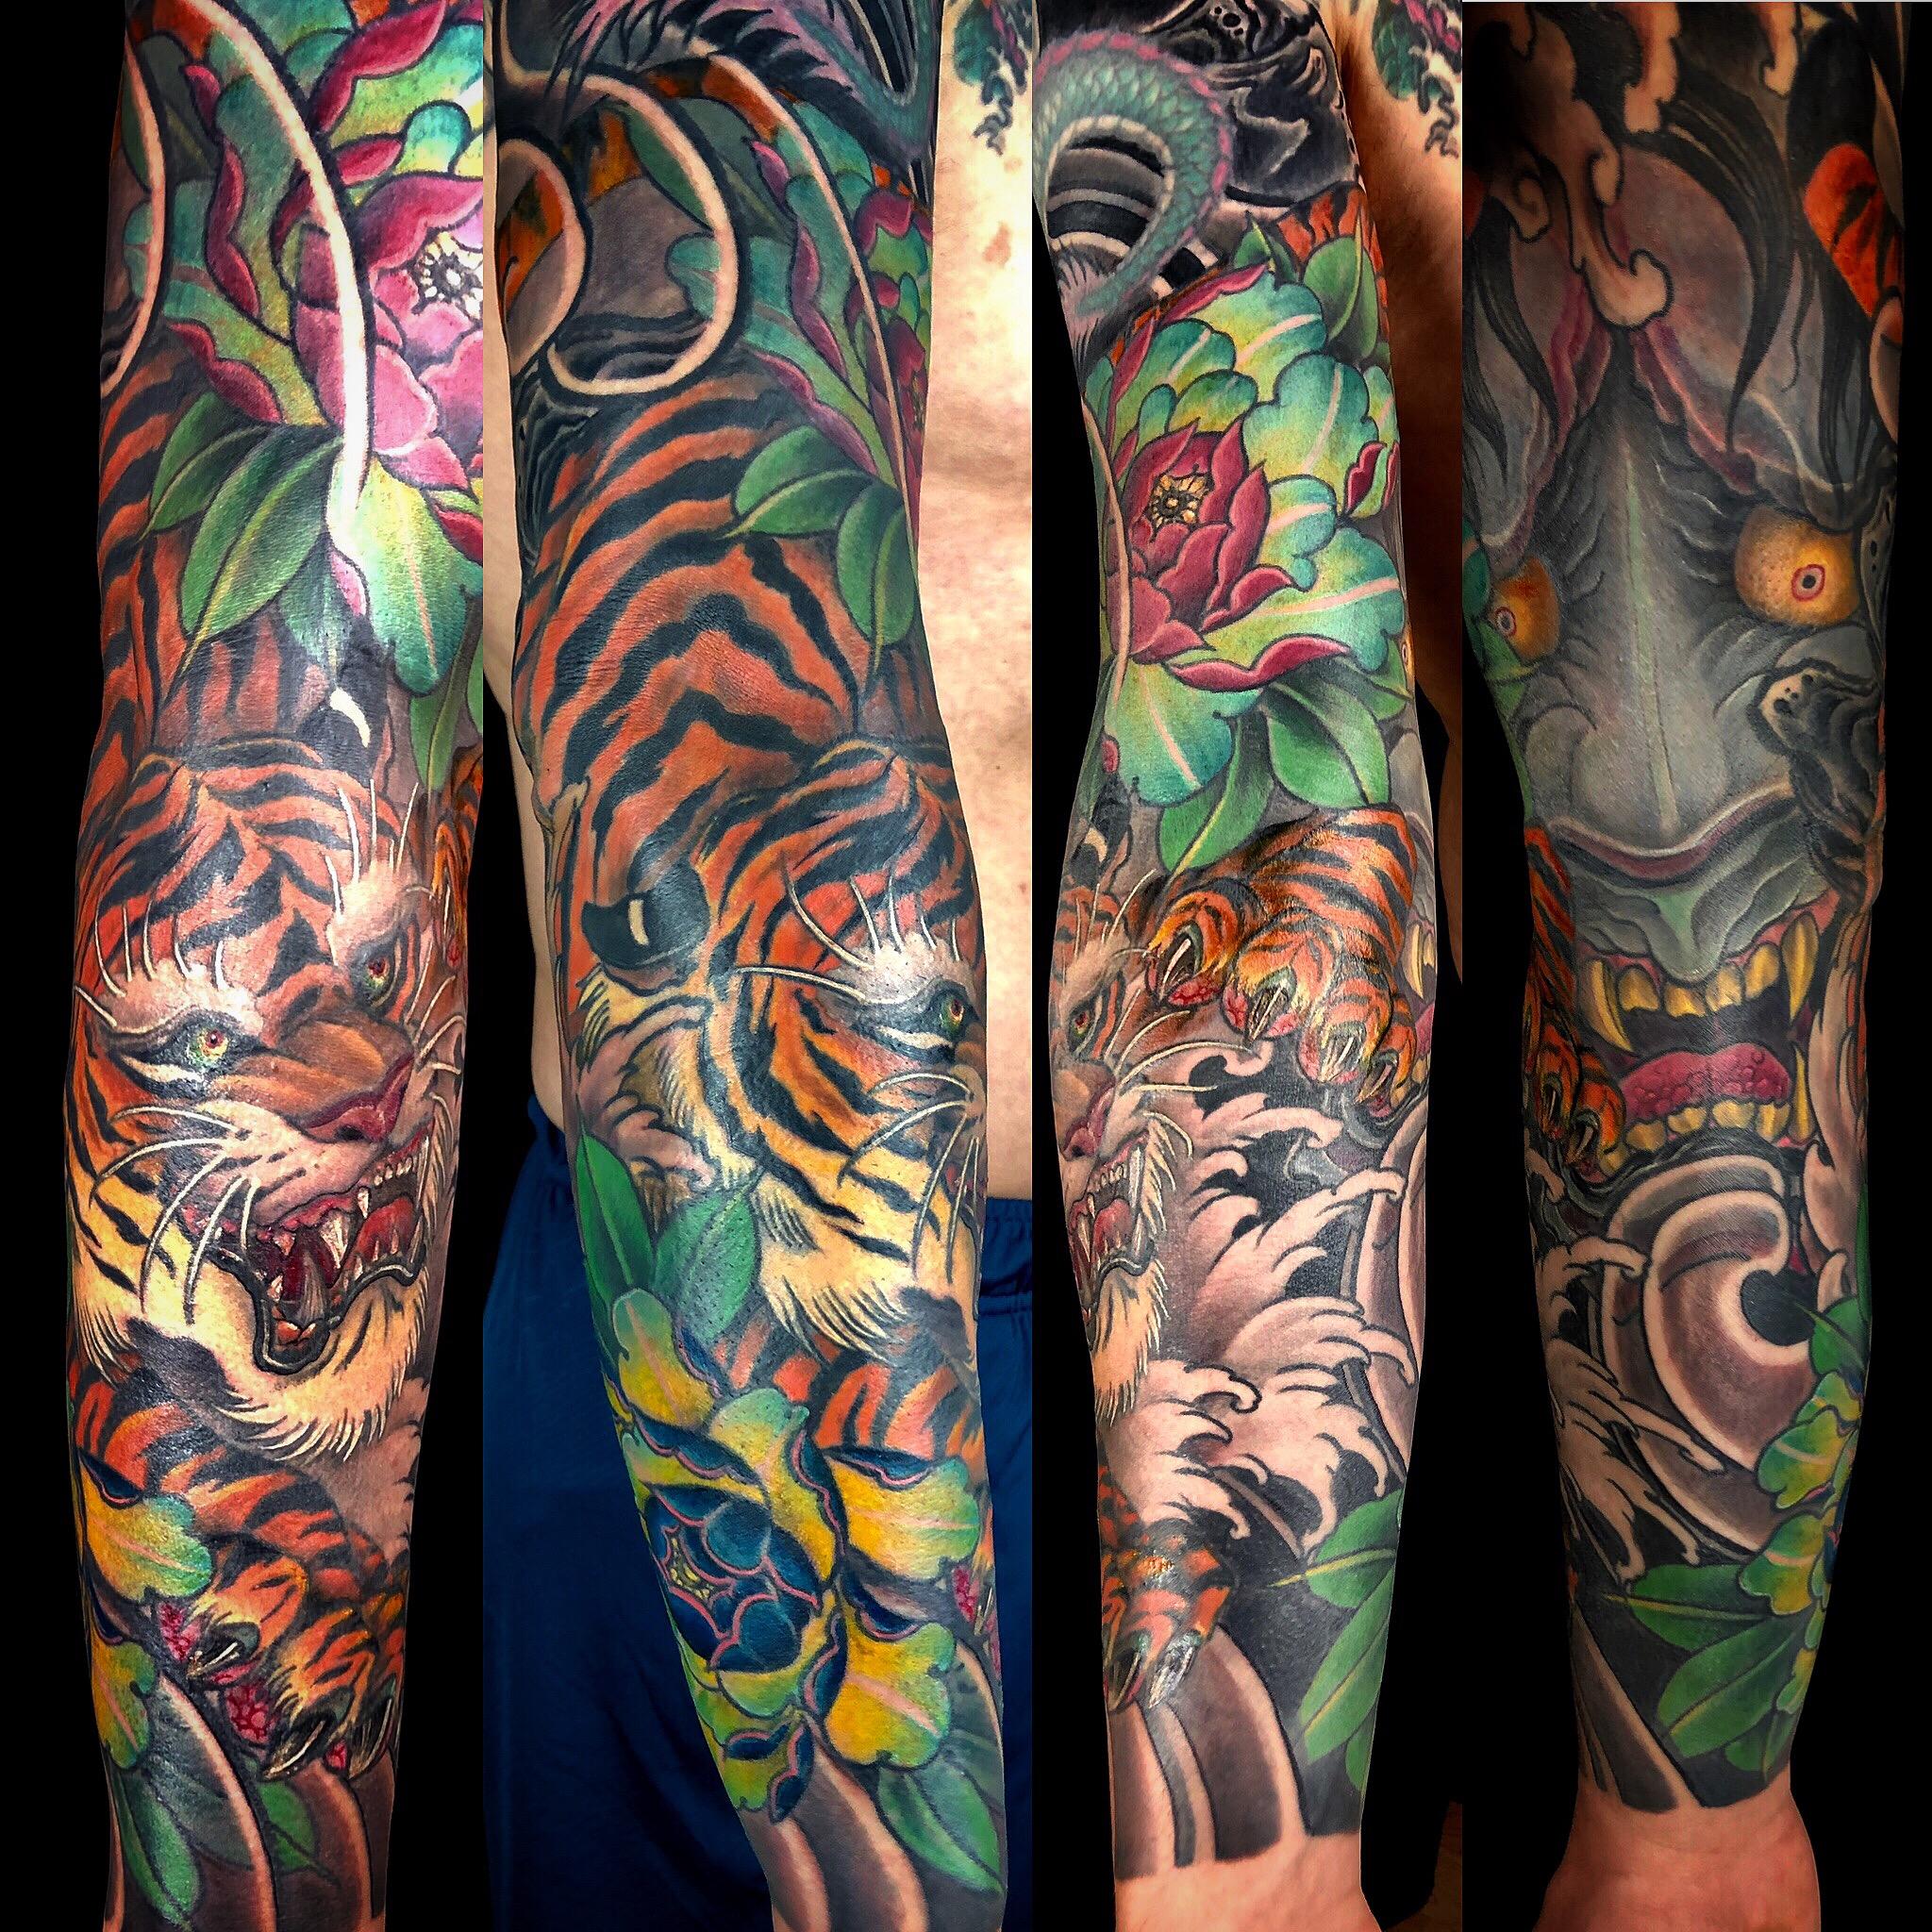 Chinesische Tattoo Motive